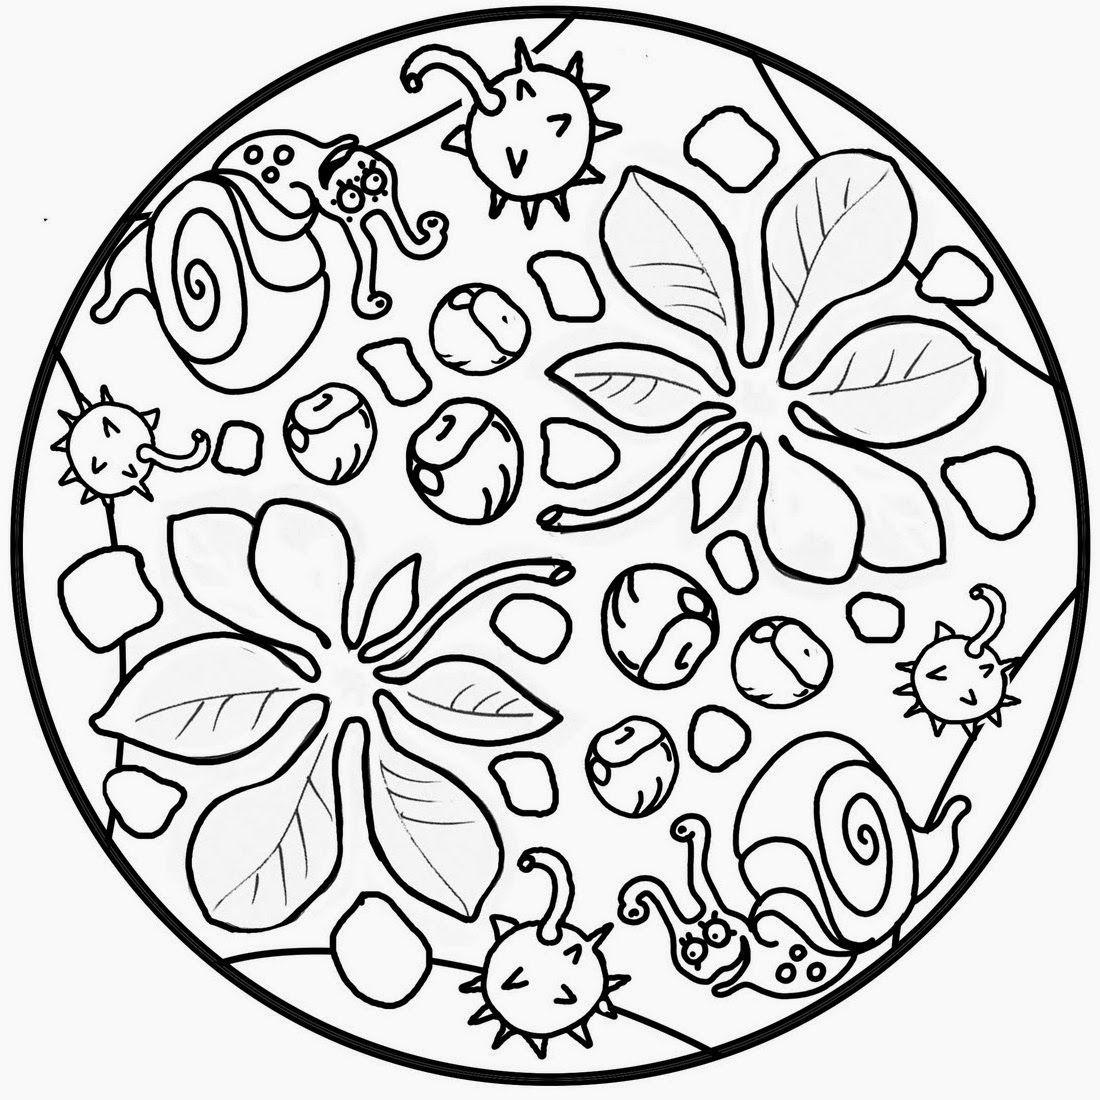 Pin By Liliane Kusters On Herfst Mandala Coloring Pages Mandalas For Kids Mandala Coloring